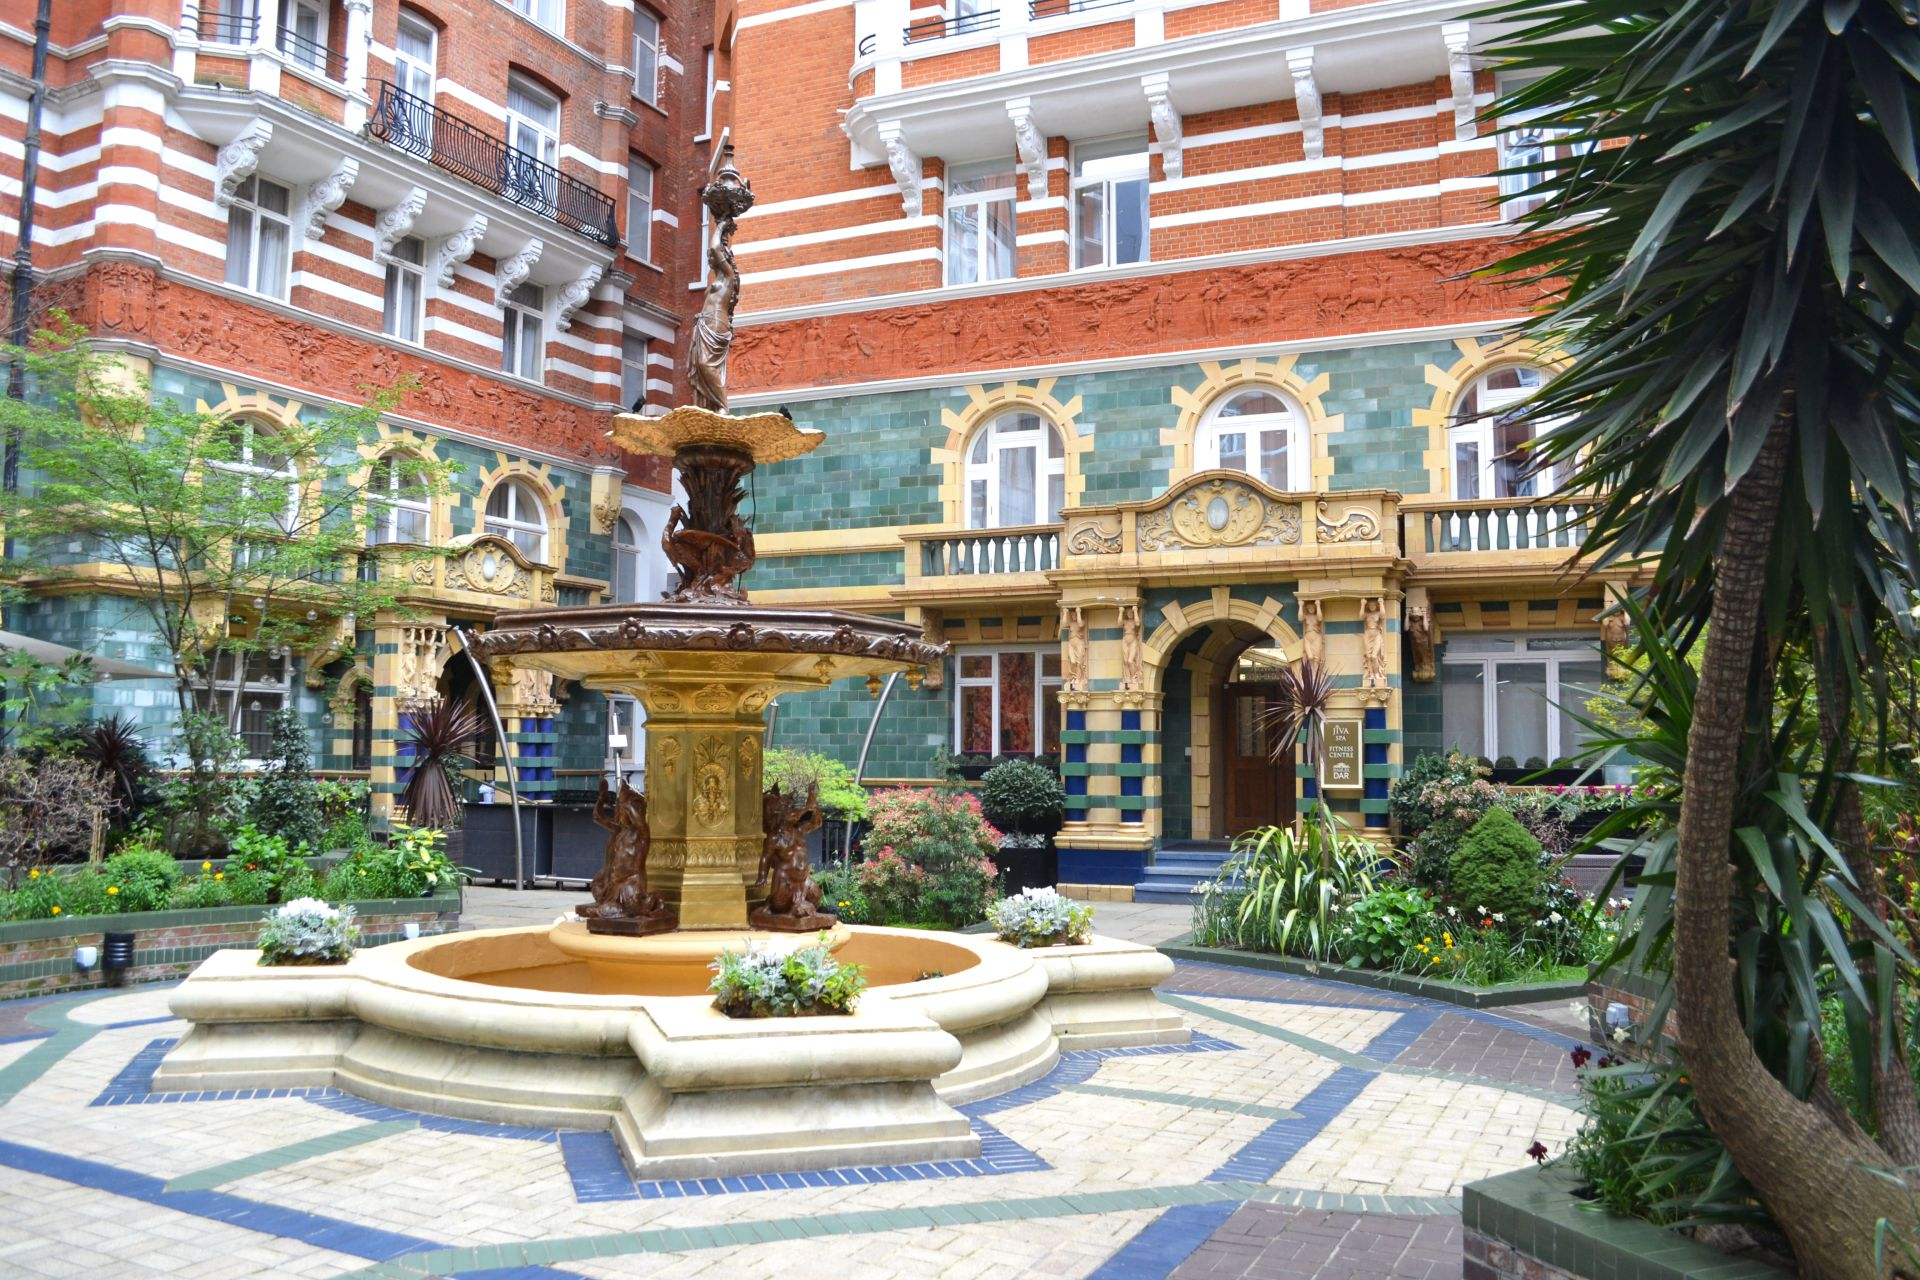 Spacemize @St. James' Court, A Taj Hotel, London